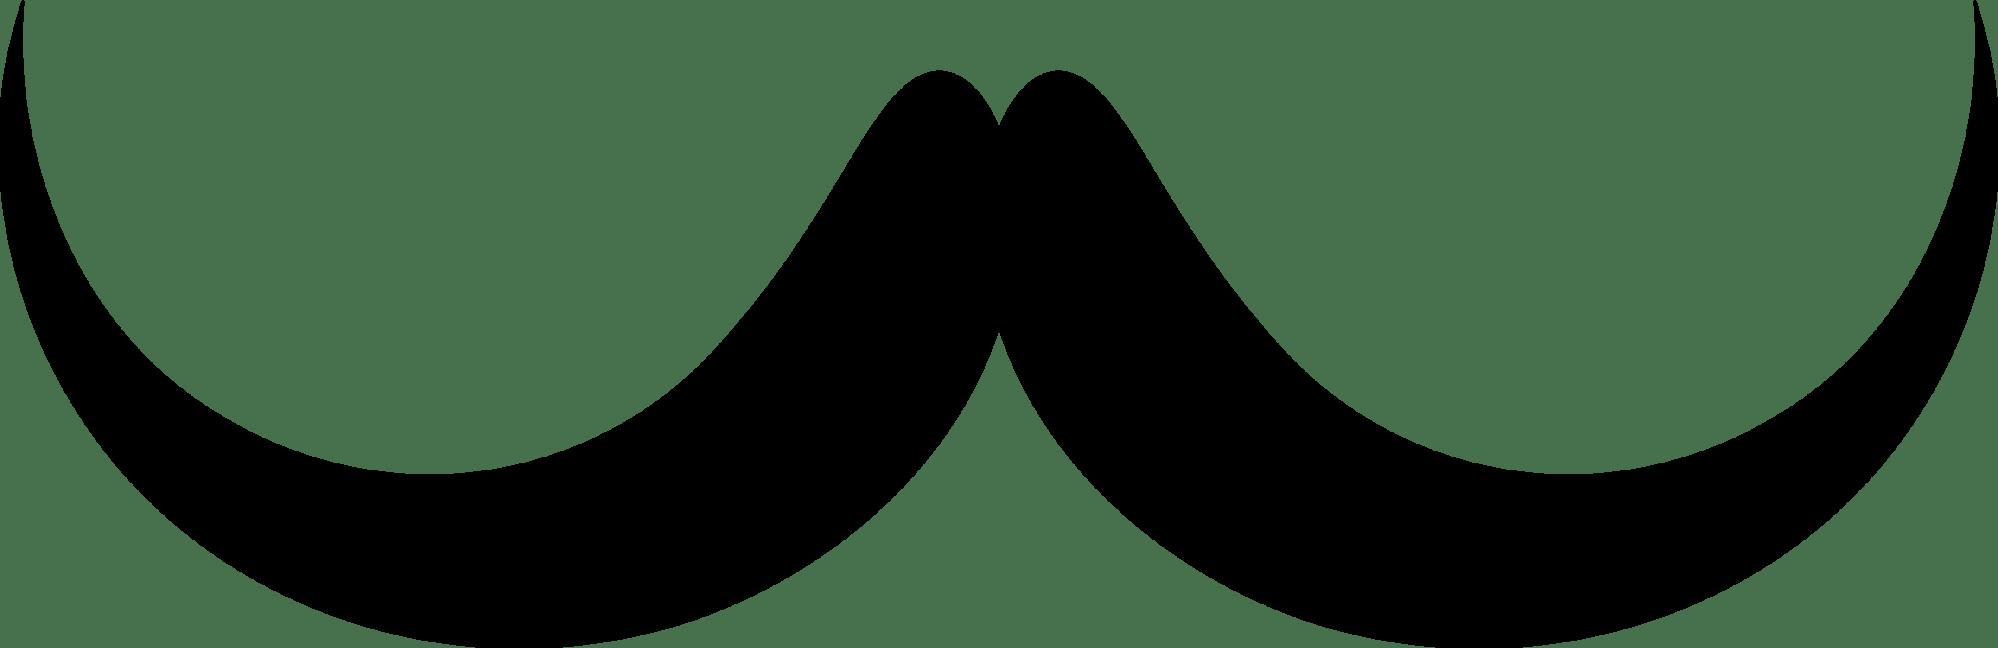 hight resolution of handlebar moustache silhouette brown hair beard